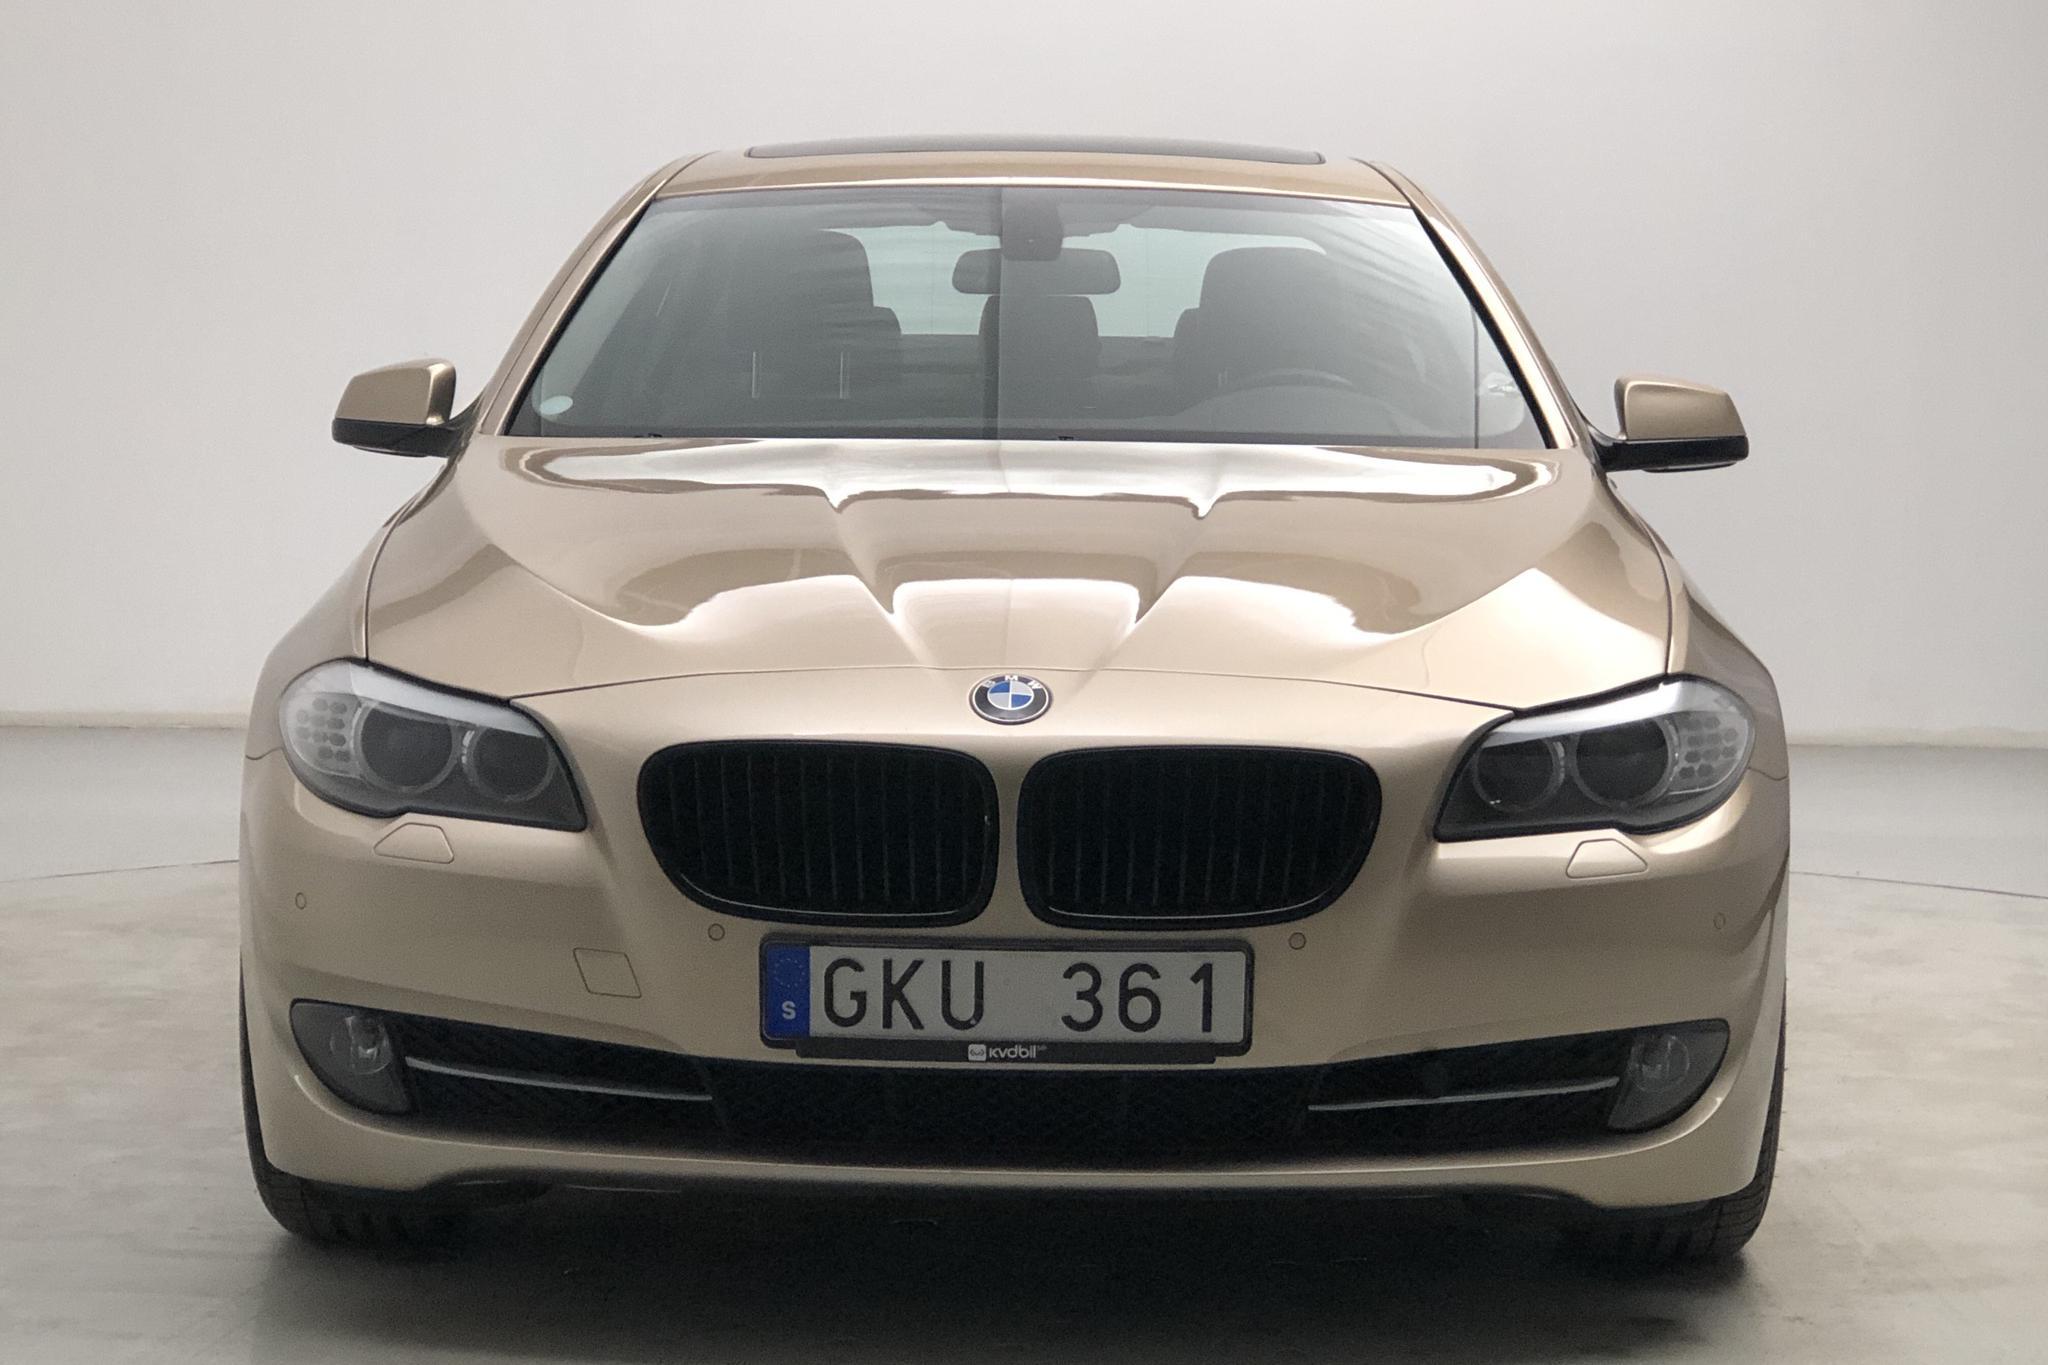 BMW 528i Sedan, F10 (258hk) - 115 530 km - Automatic - Light Brown - 2010